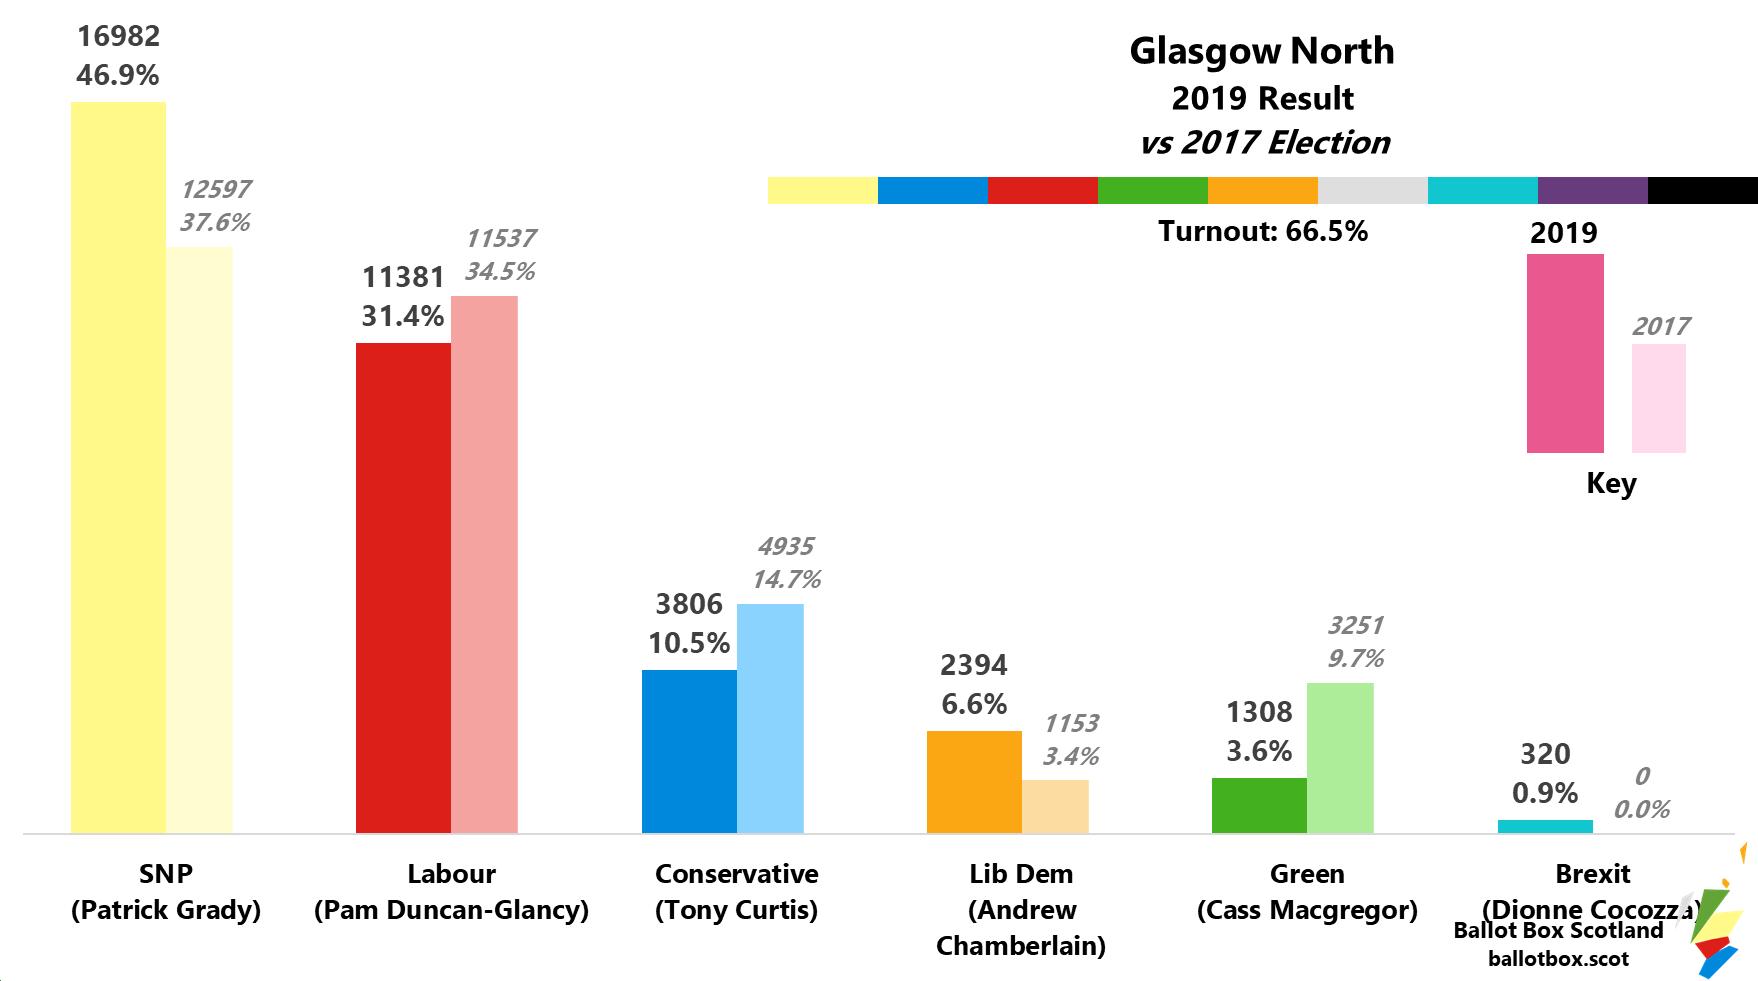 Glasgow North 2019